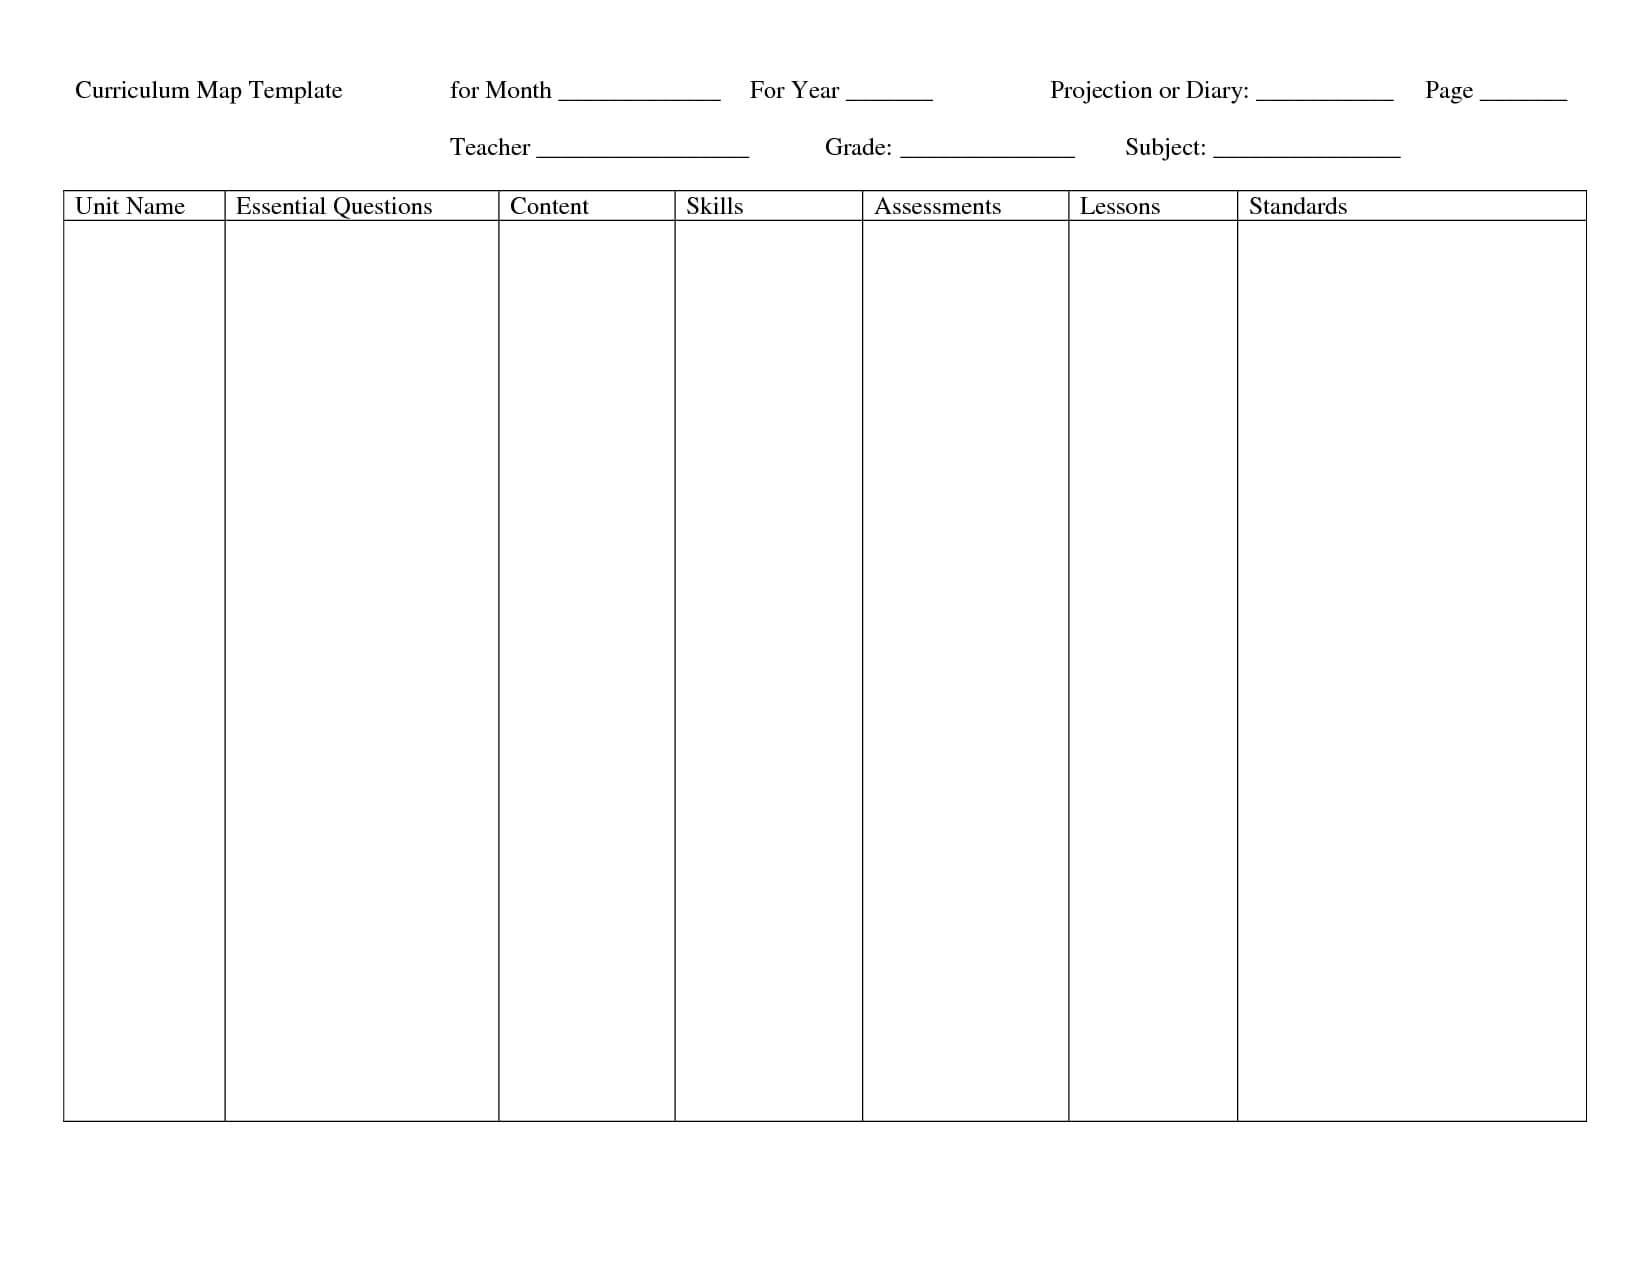 Monthly Curriculum Map Template | Curriculum Map Template Regarding Blank Curriculum Map Template